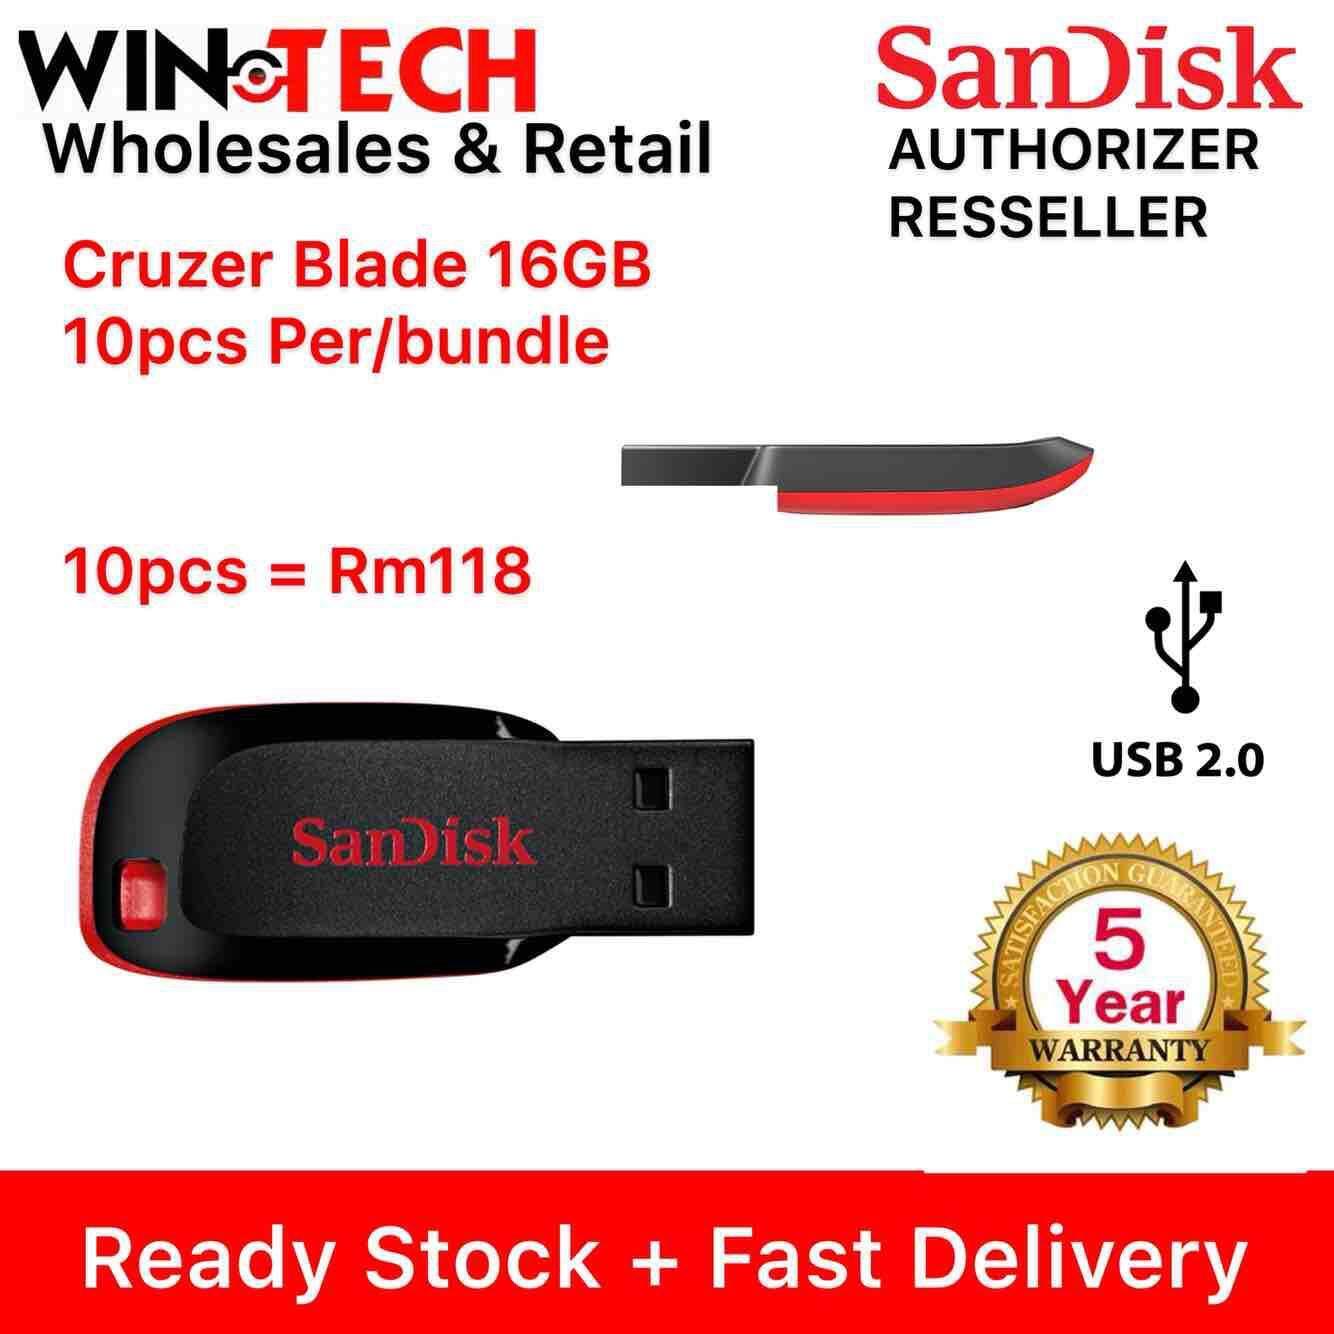 SANDISK Pendrive 16GB/32GB/64GB Cruzer Blade Flash Drive USB 2.0